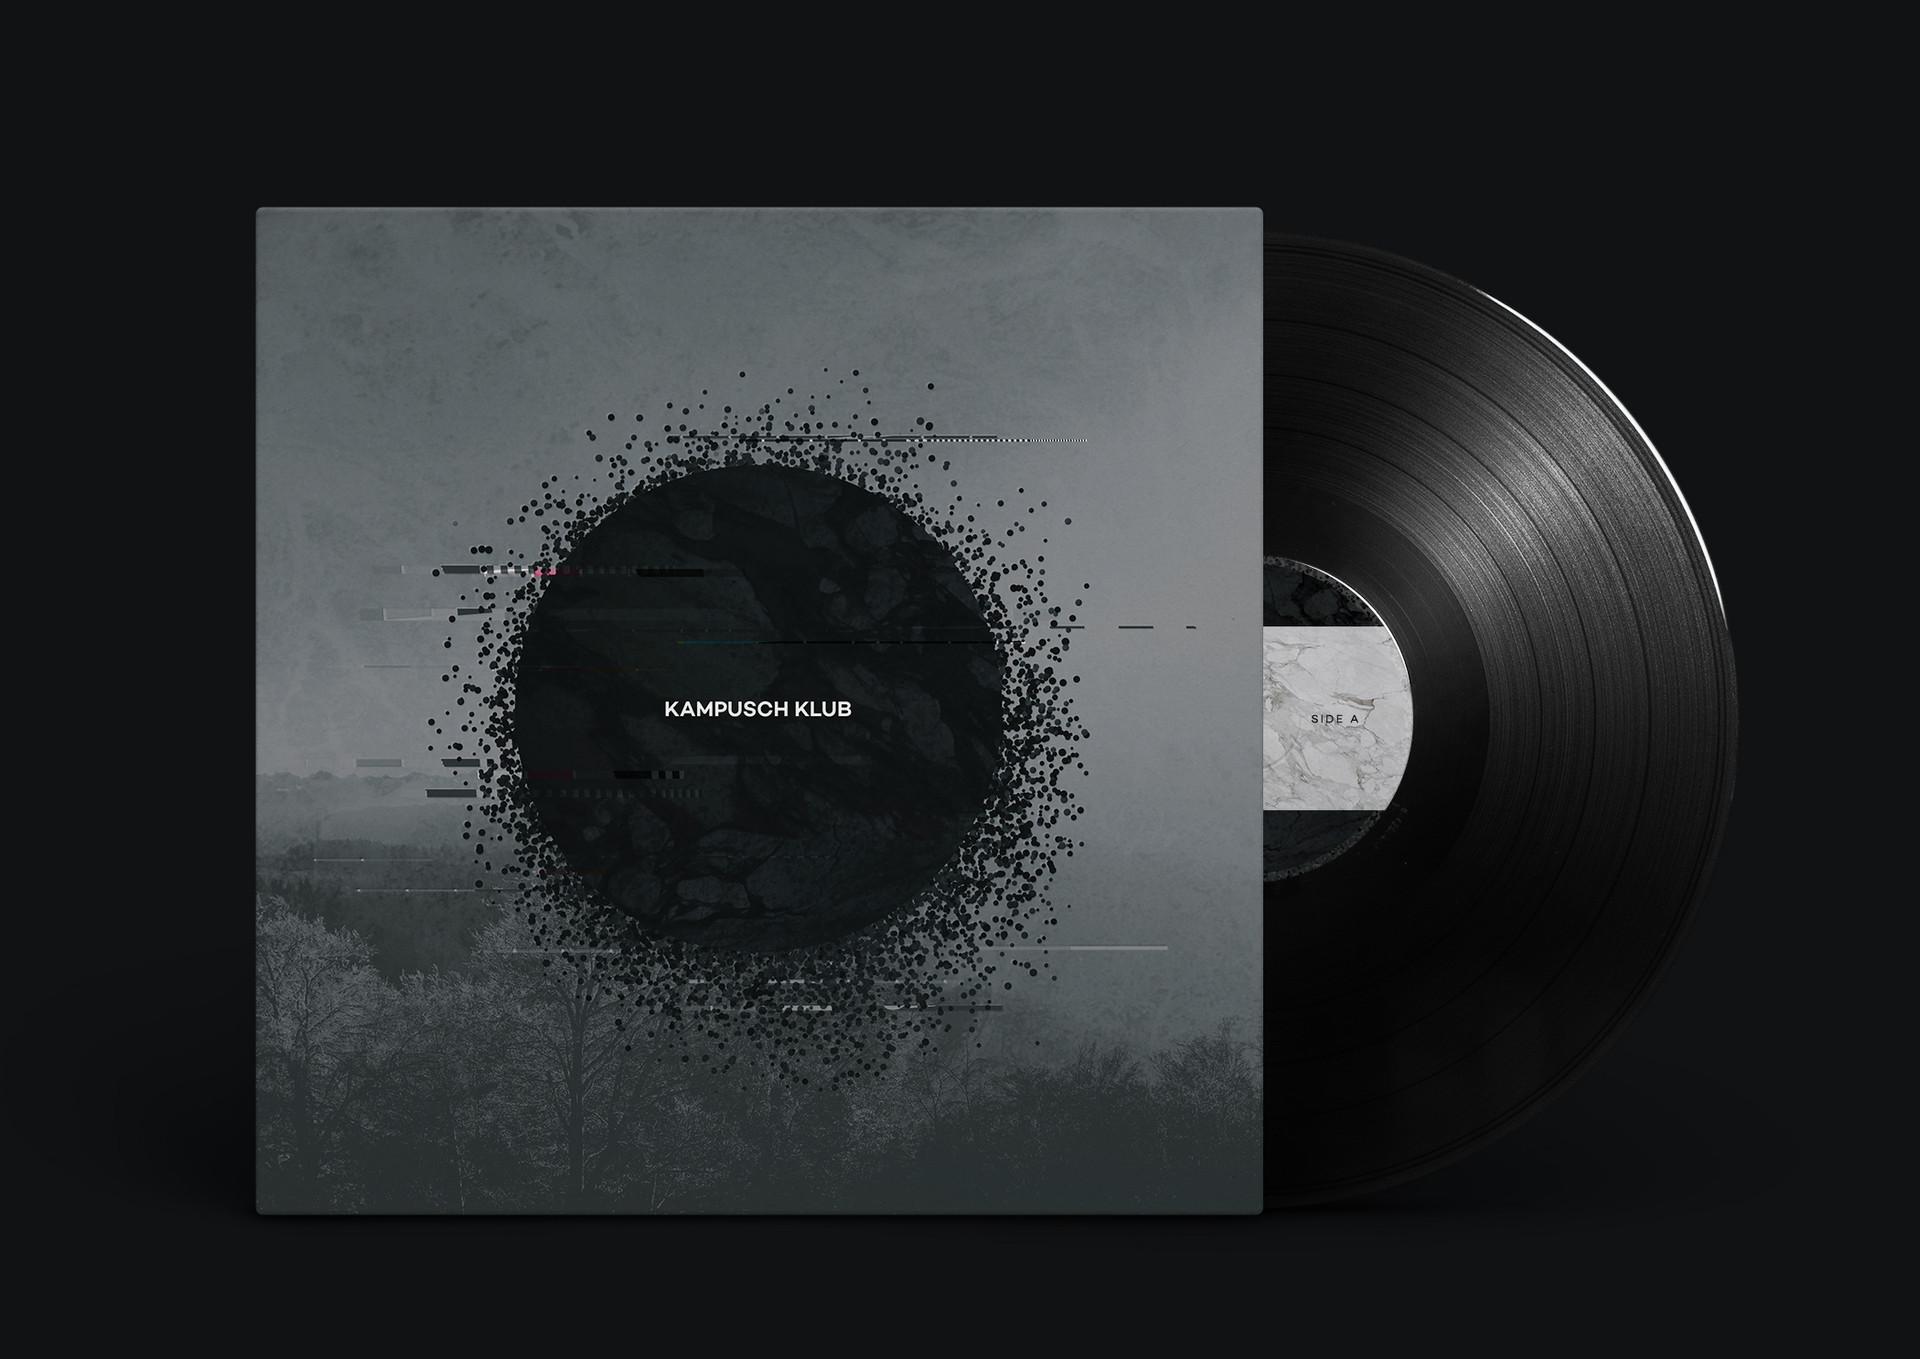 Vinyl_record_kampuschklub-back.jpg